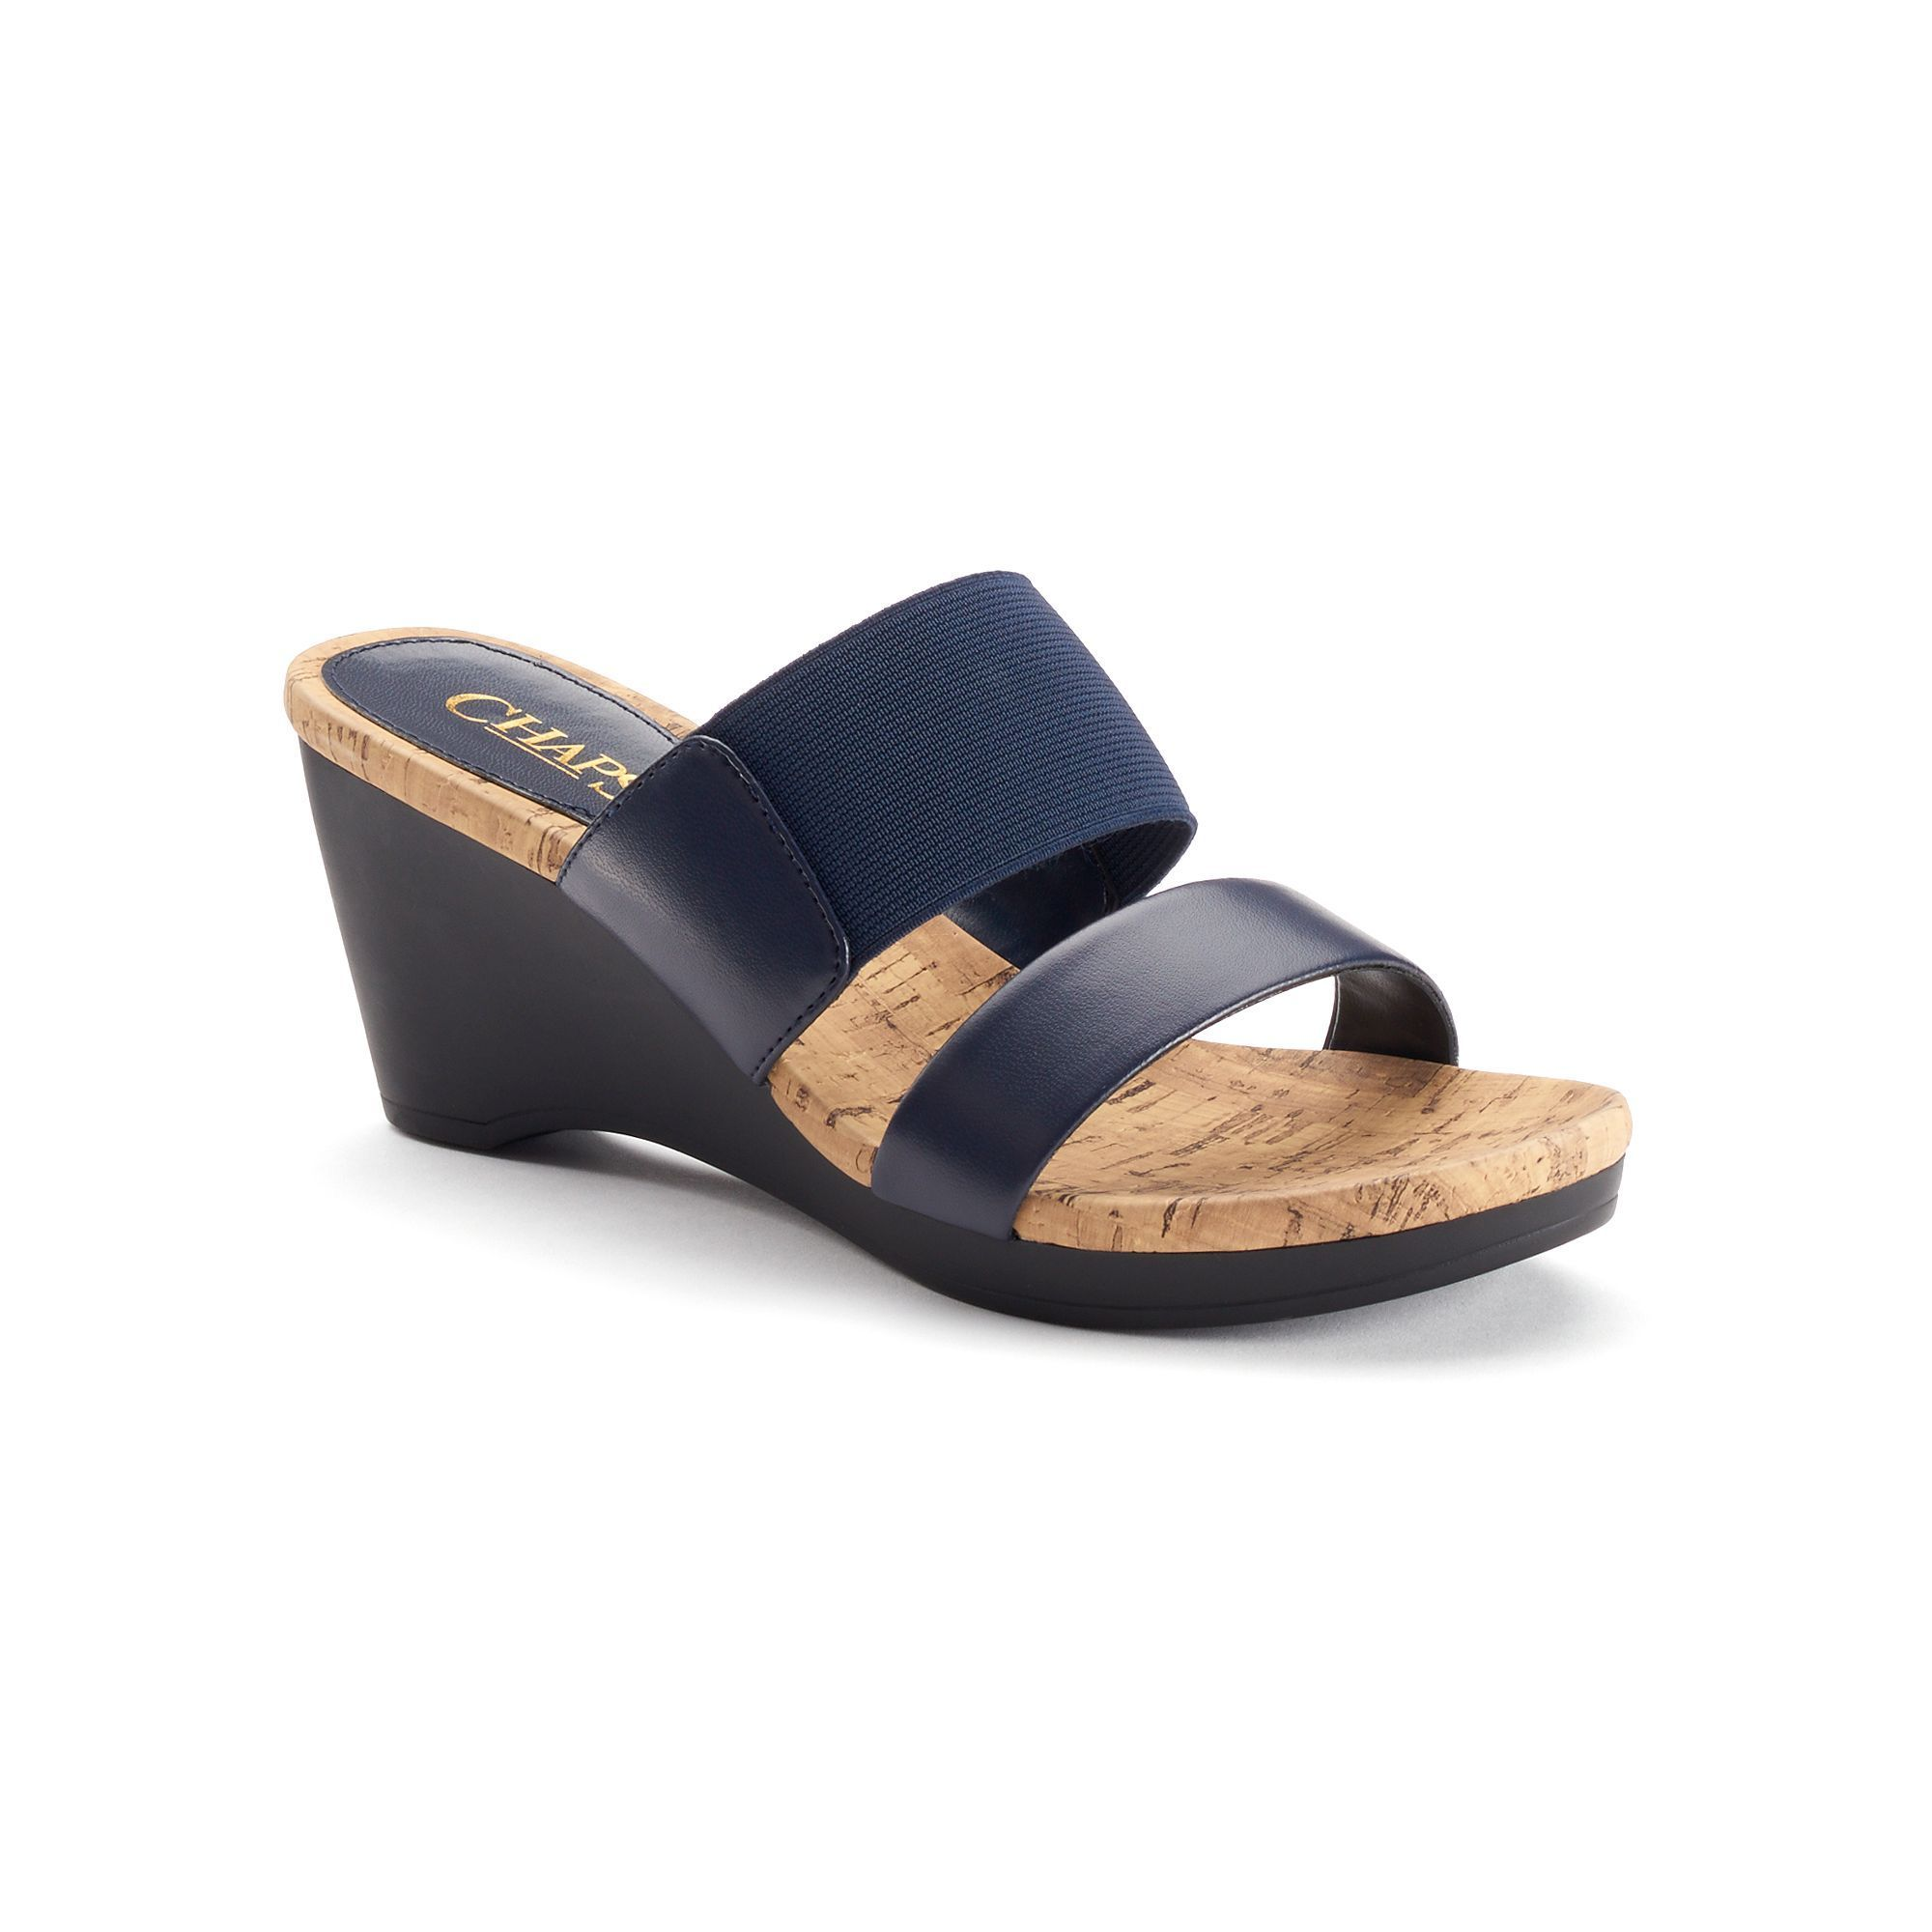 Womens sandals in size 11 - Chaps Rhoda Women S Slip On Wedge Dress Sandals Size 11 B Blue Navy